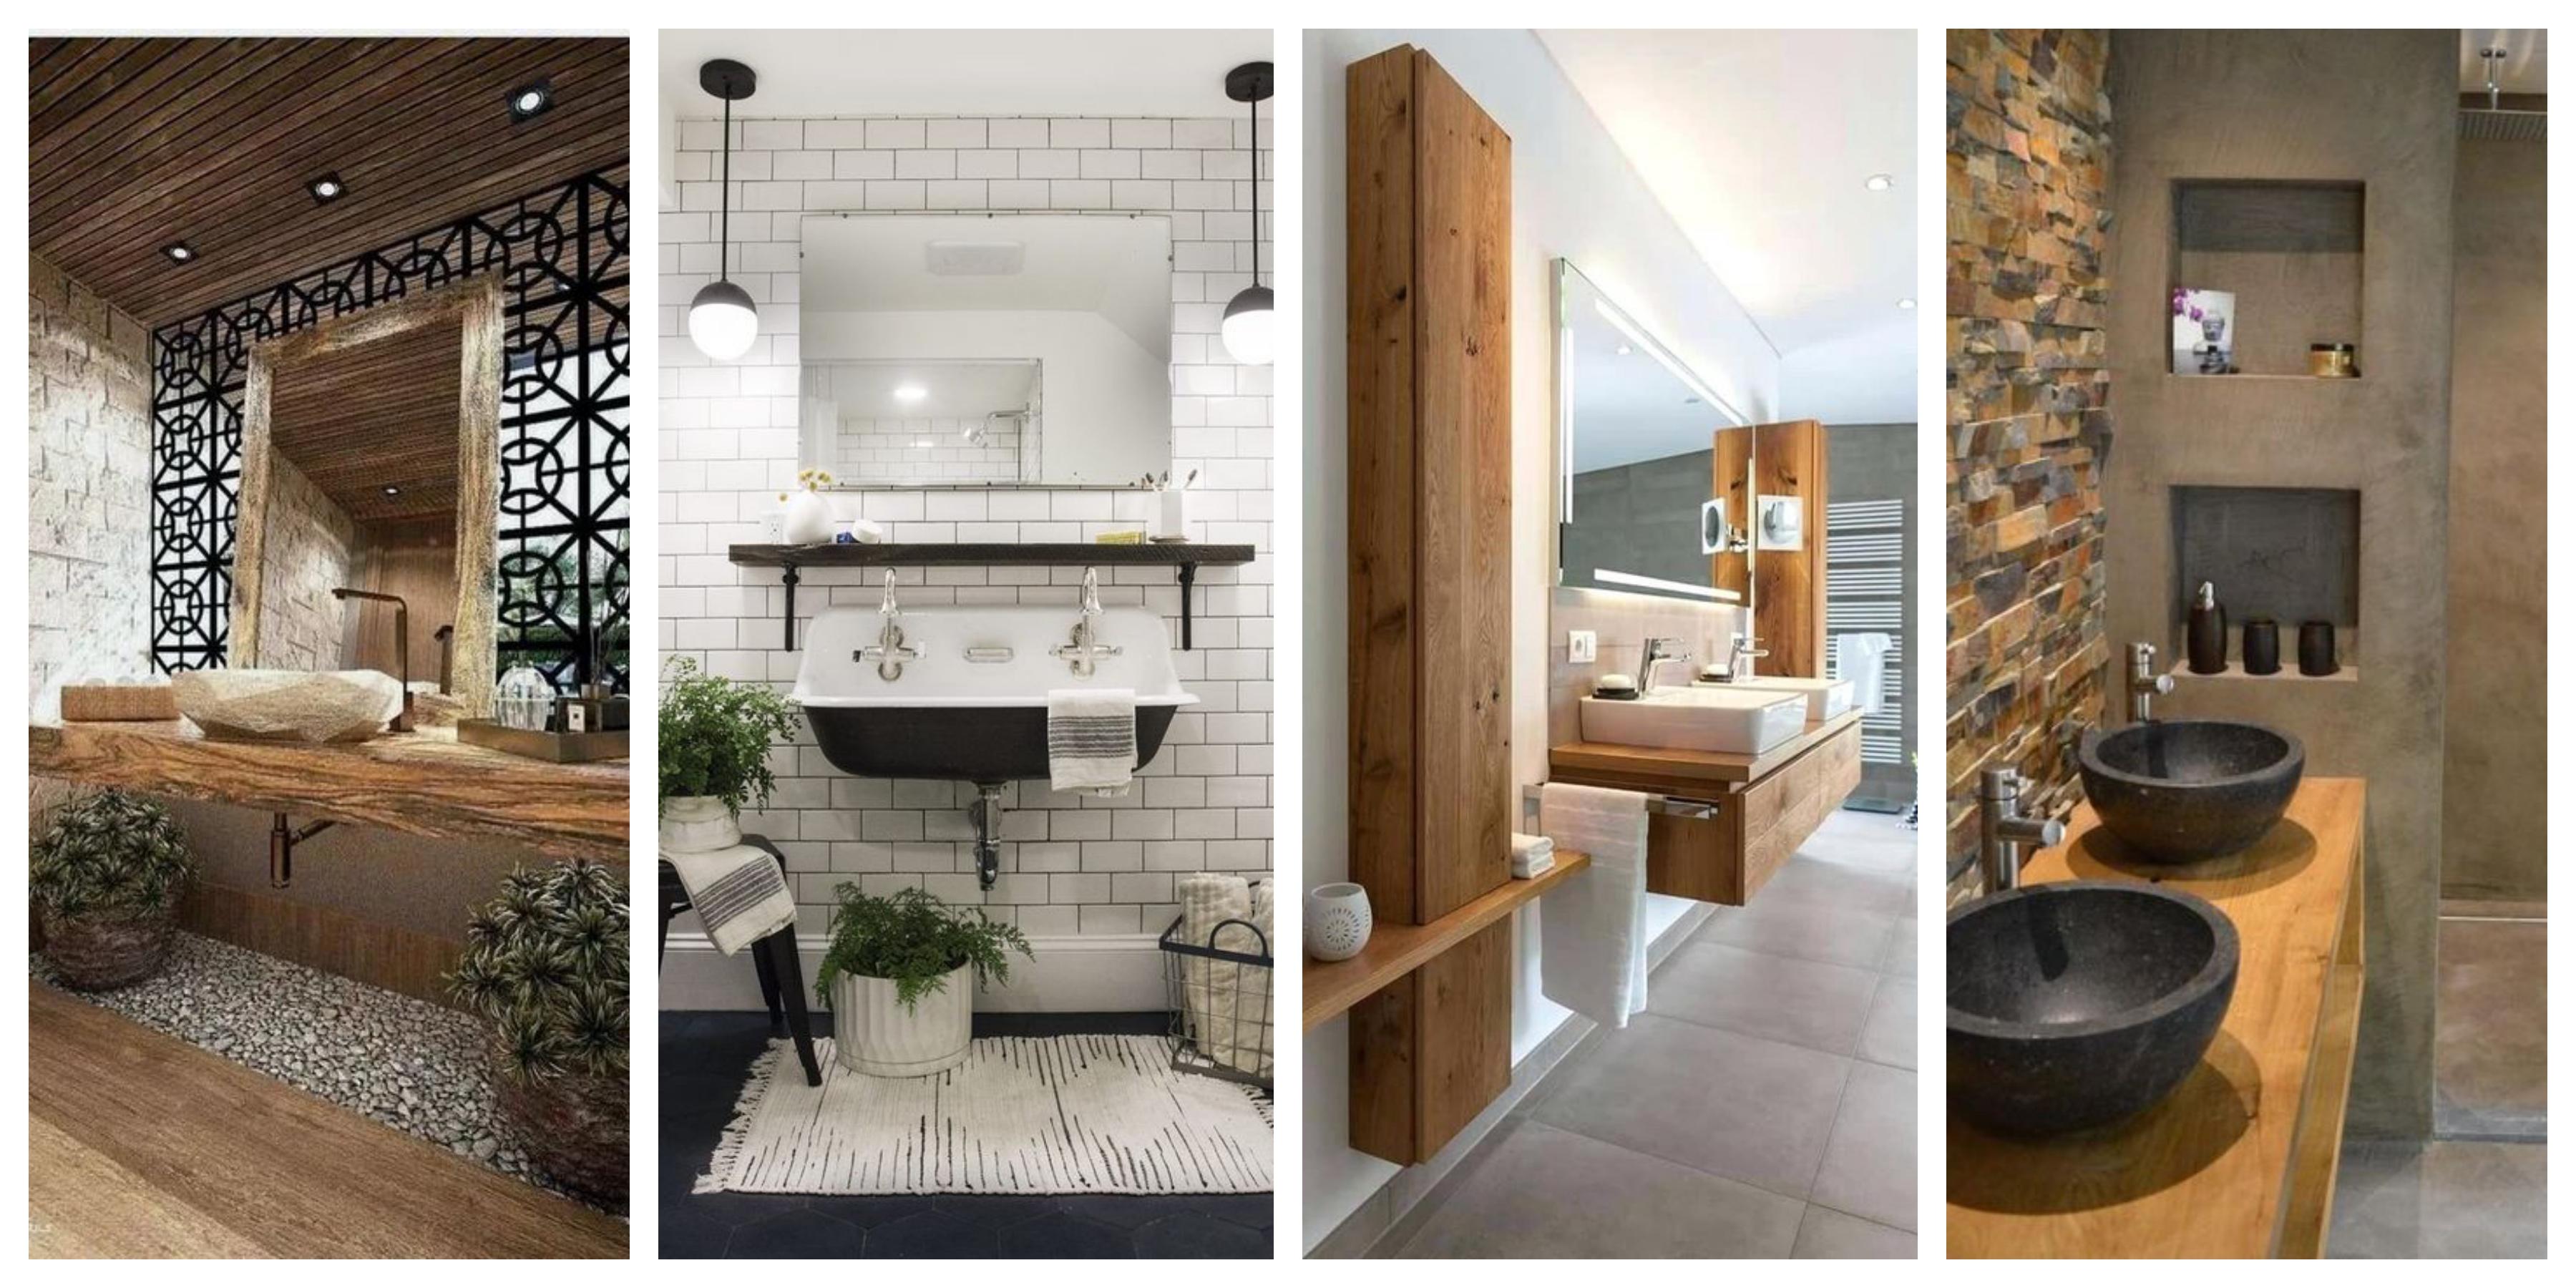 Rekonstrukce koupelny - inspirace, fotogalerie